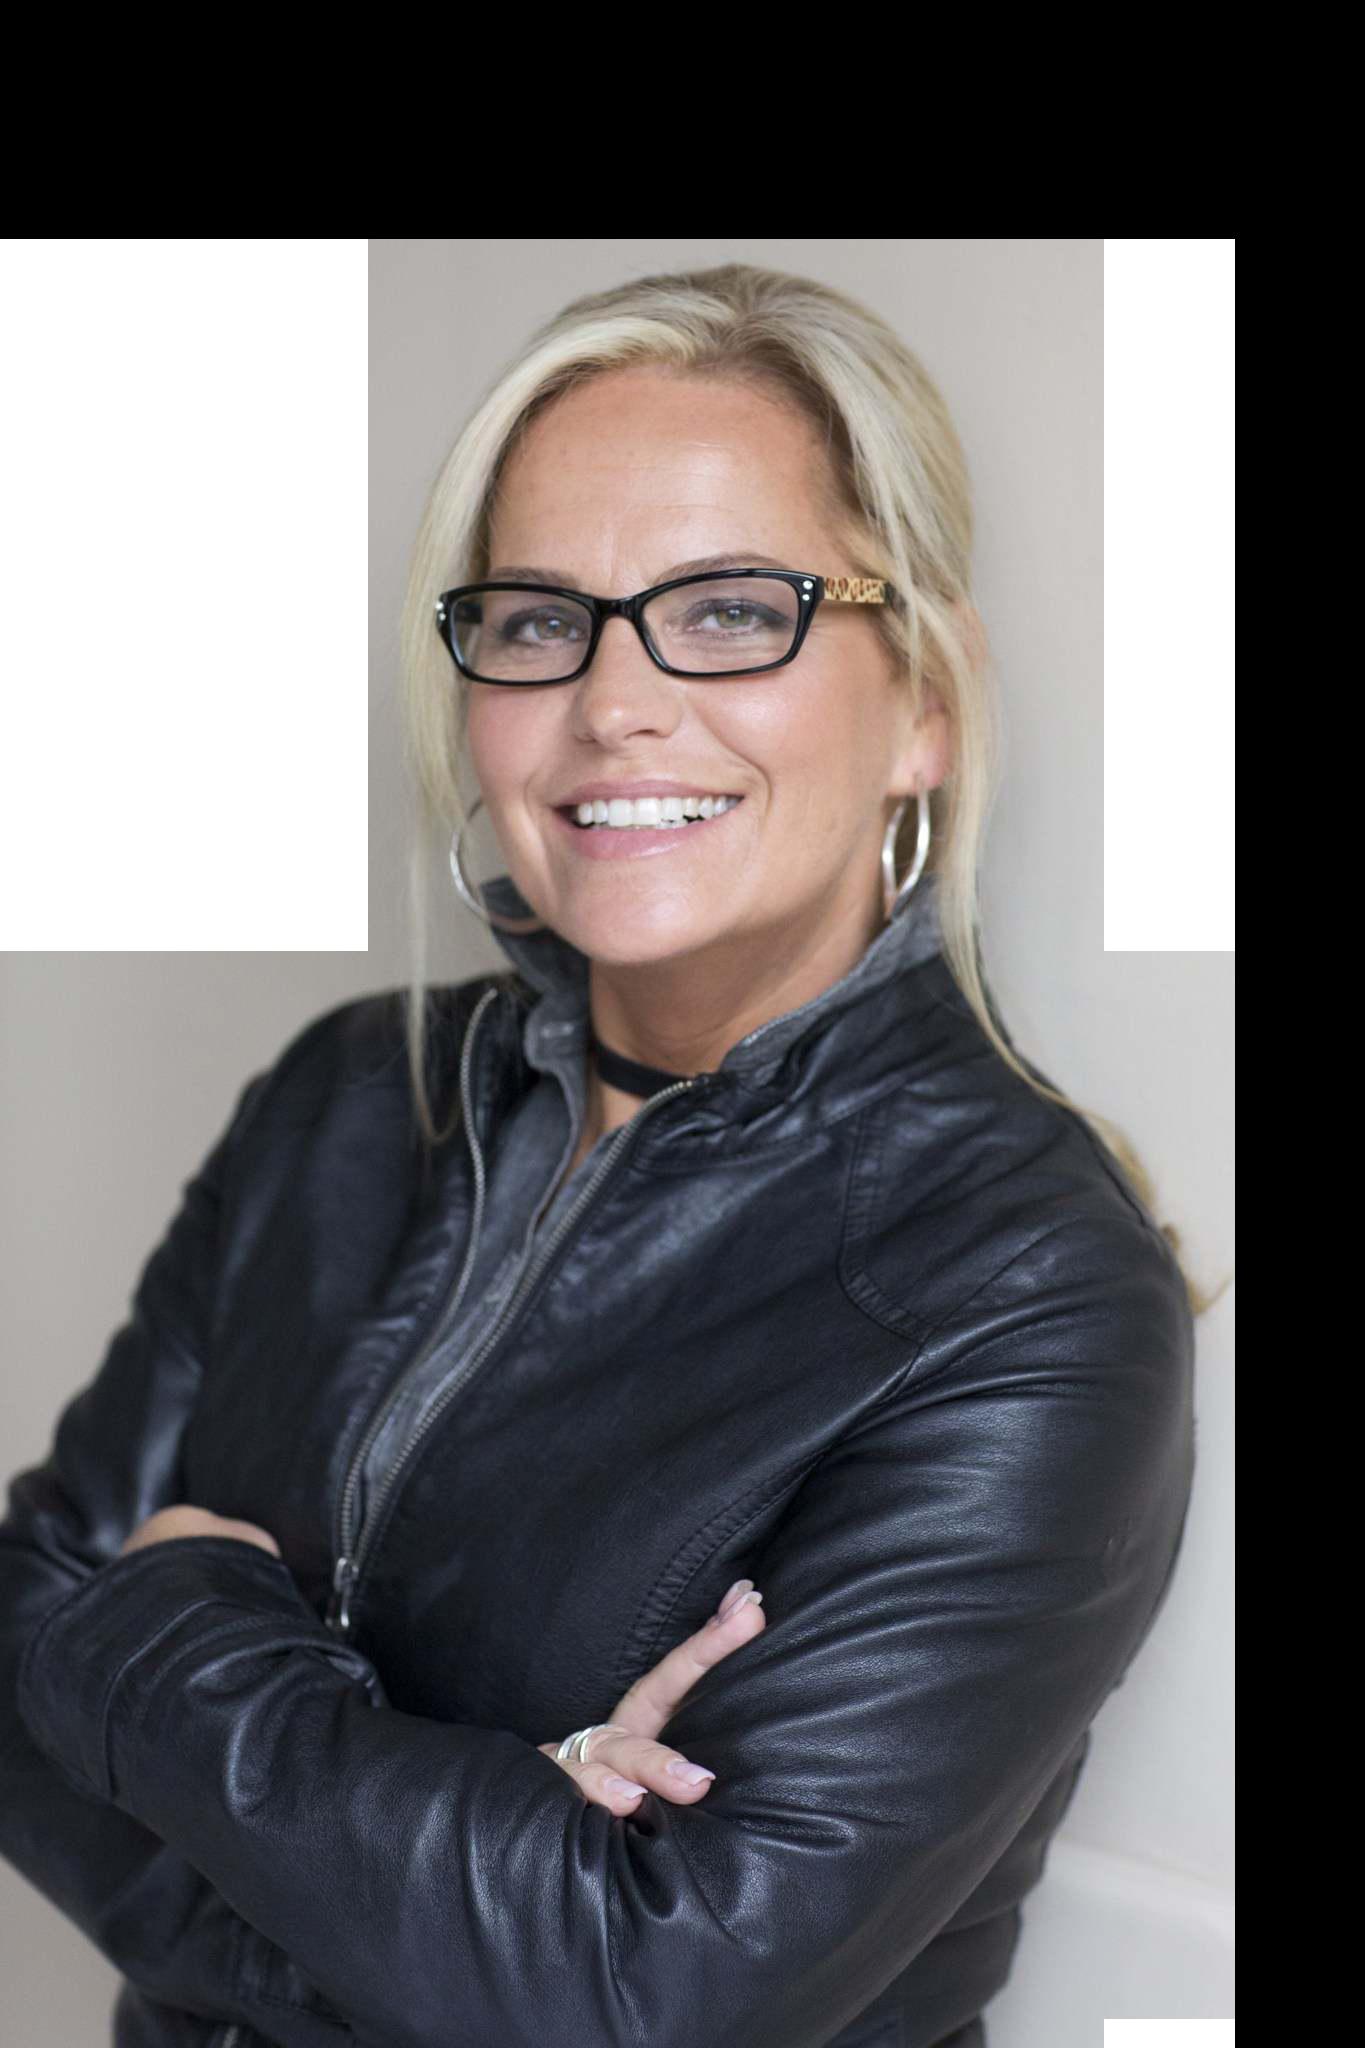 Christine Beckwith, Master Coach